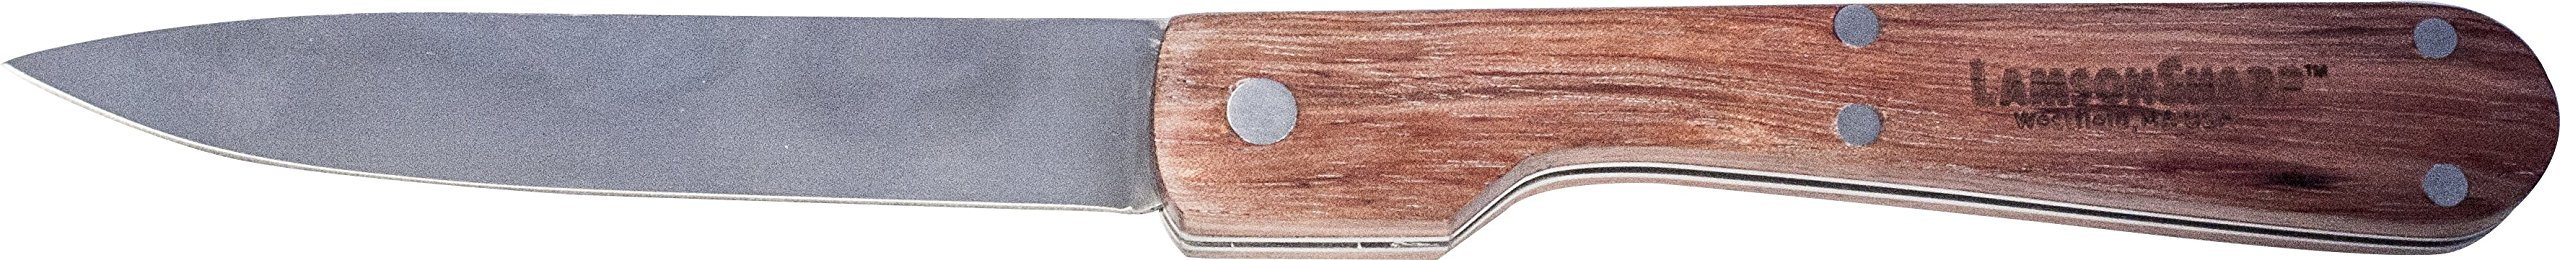 "Lamson Folding Utility Knife, Walnut Handle, 5-1/4"" Blade"